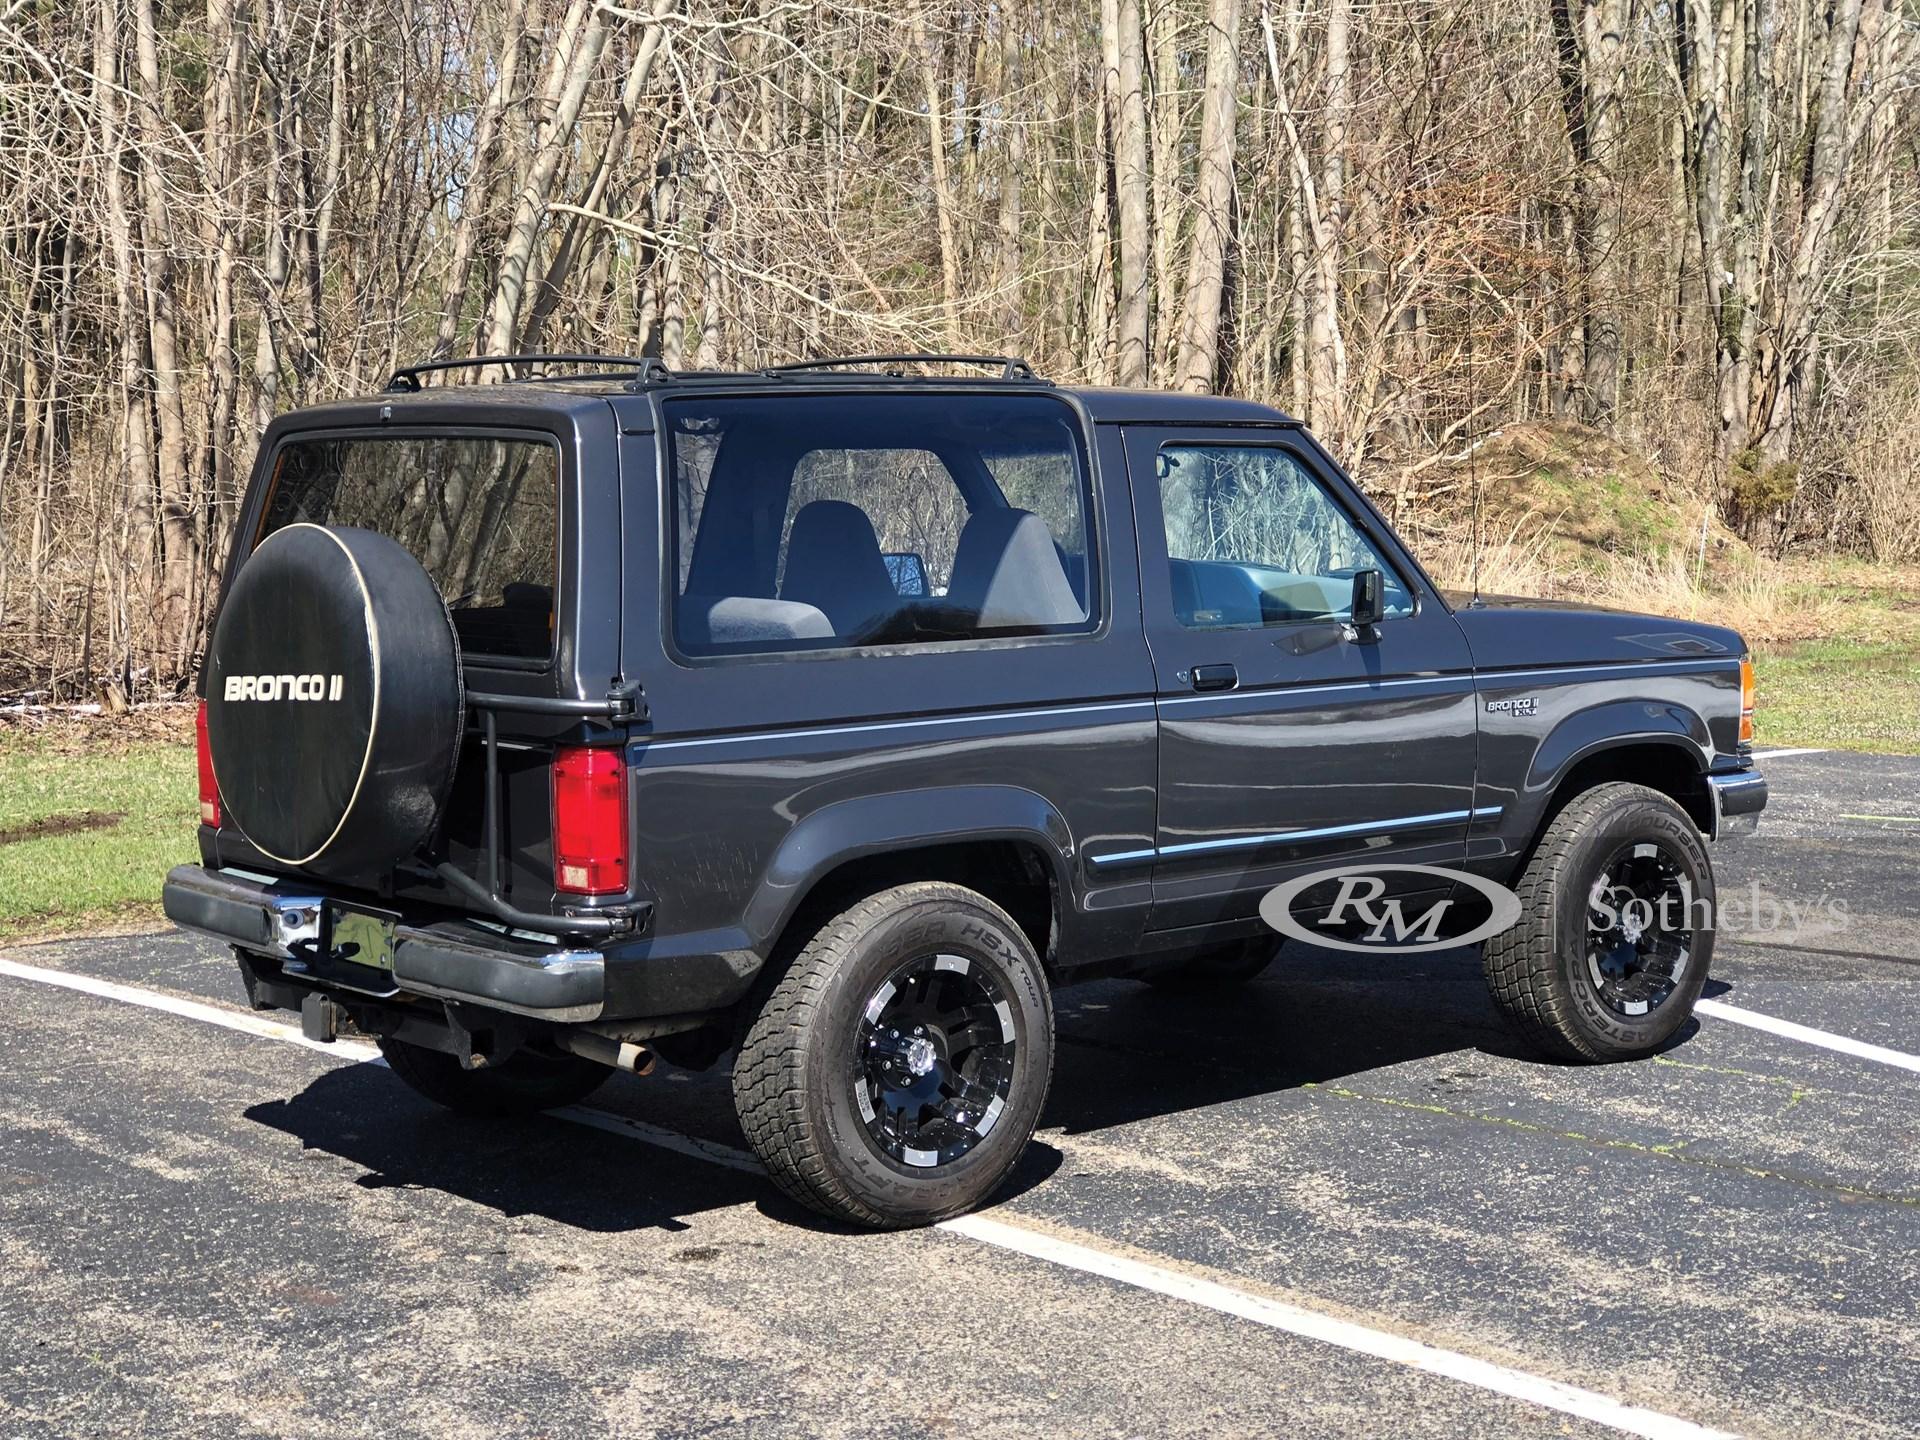 1990 Ford Bronco II XT  -